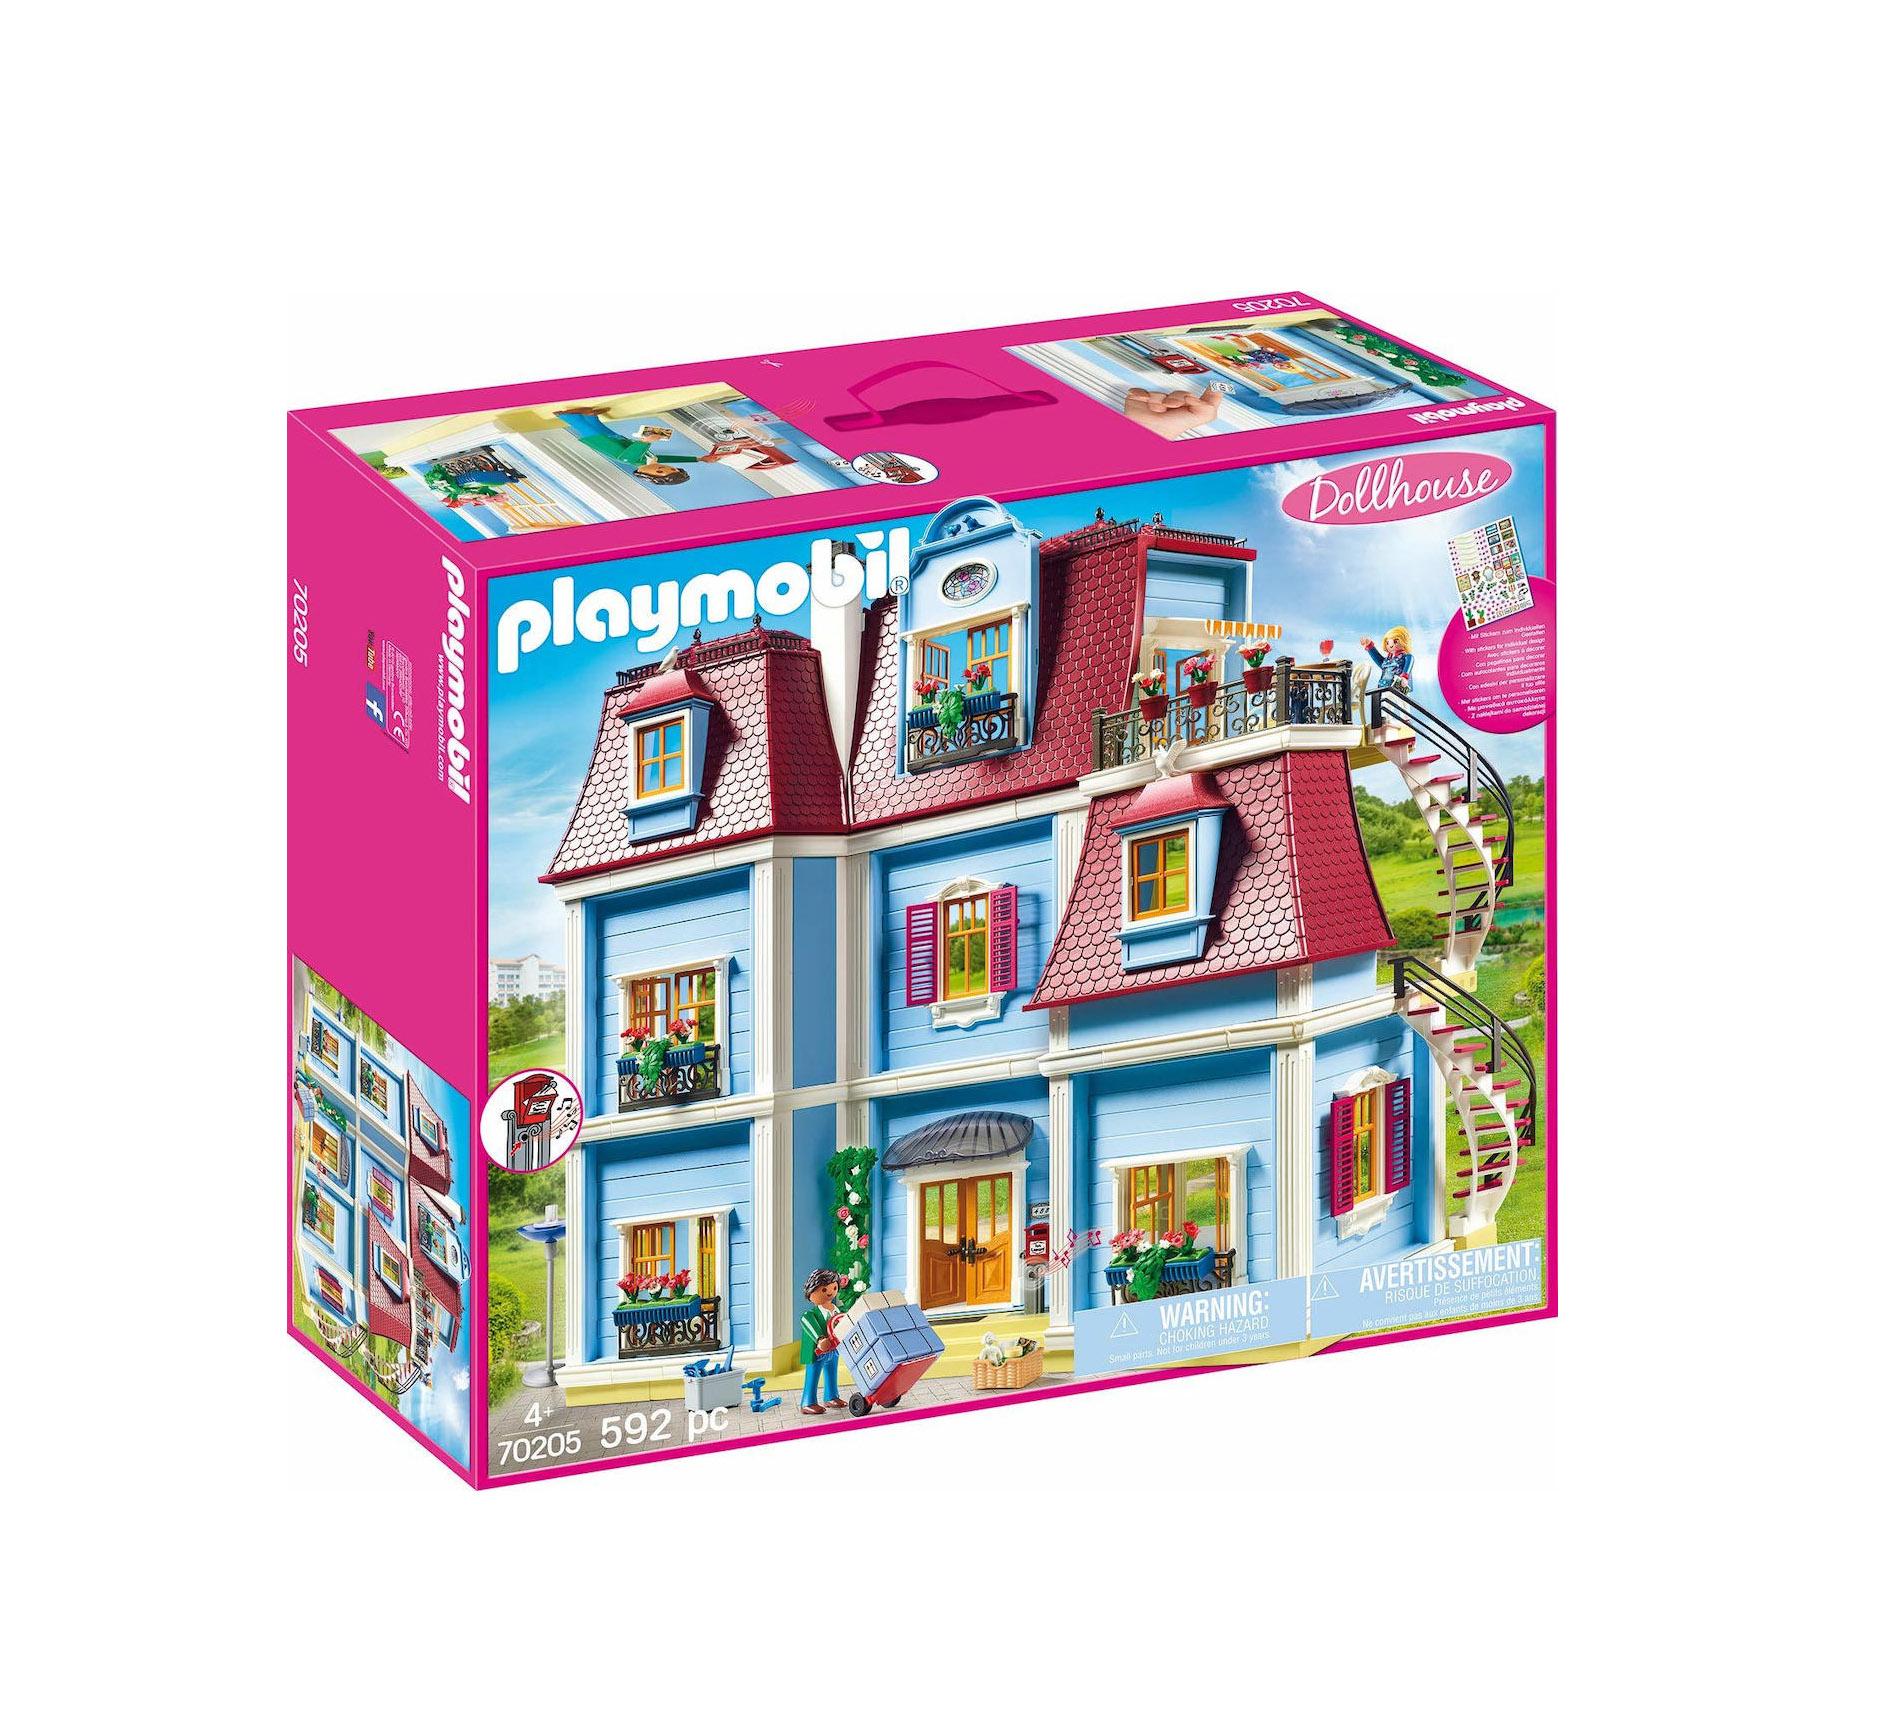 Playmobil Dollhouse: Large Dollhouse 70205